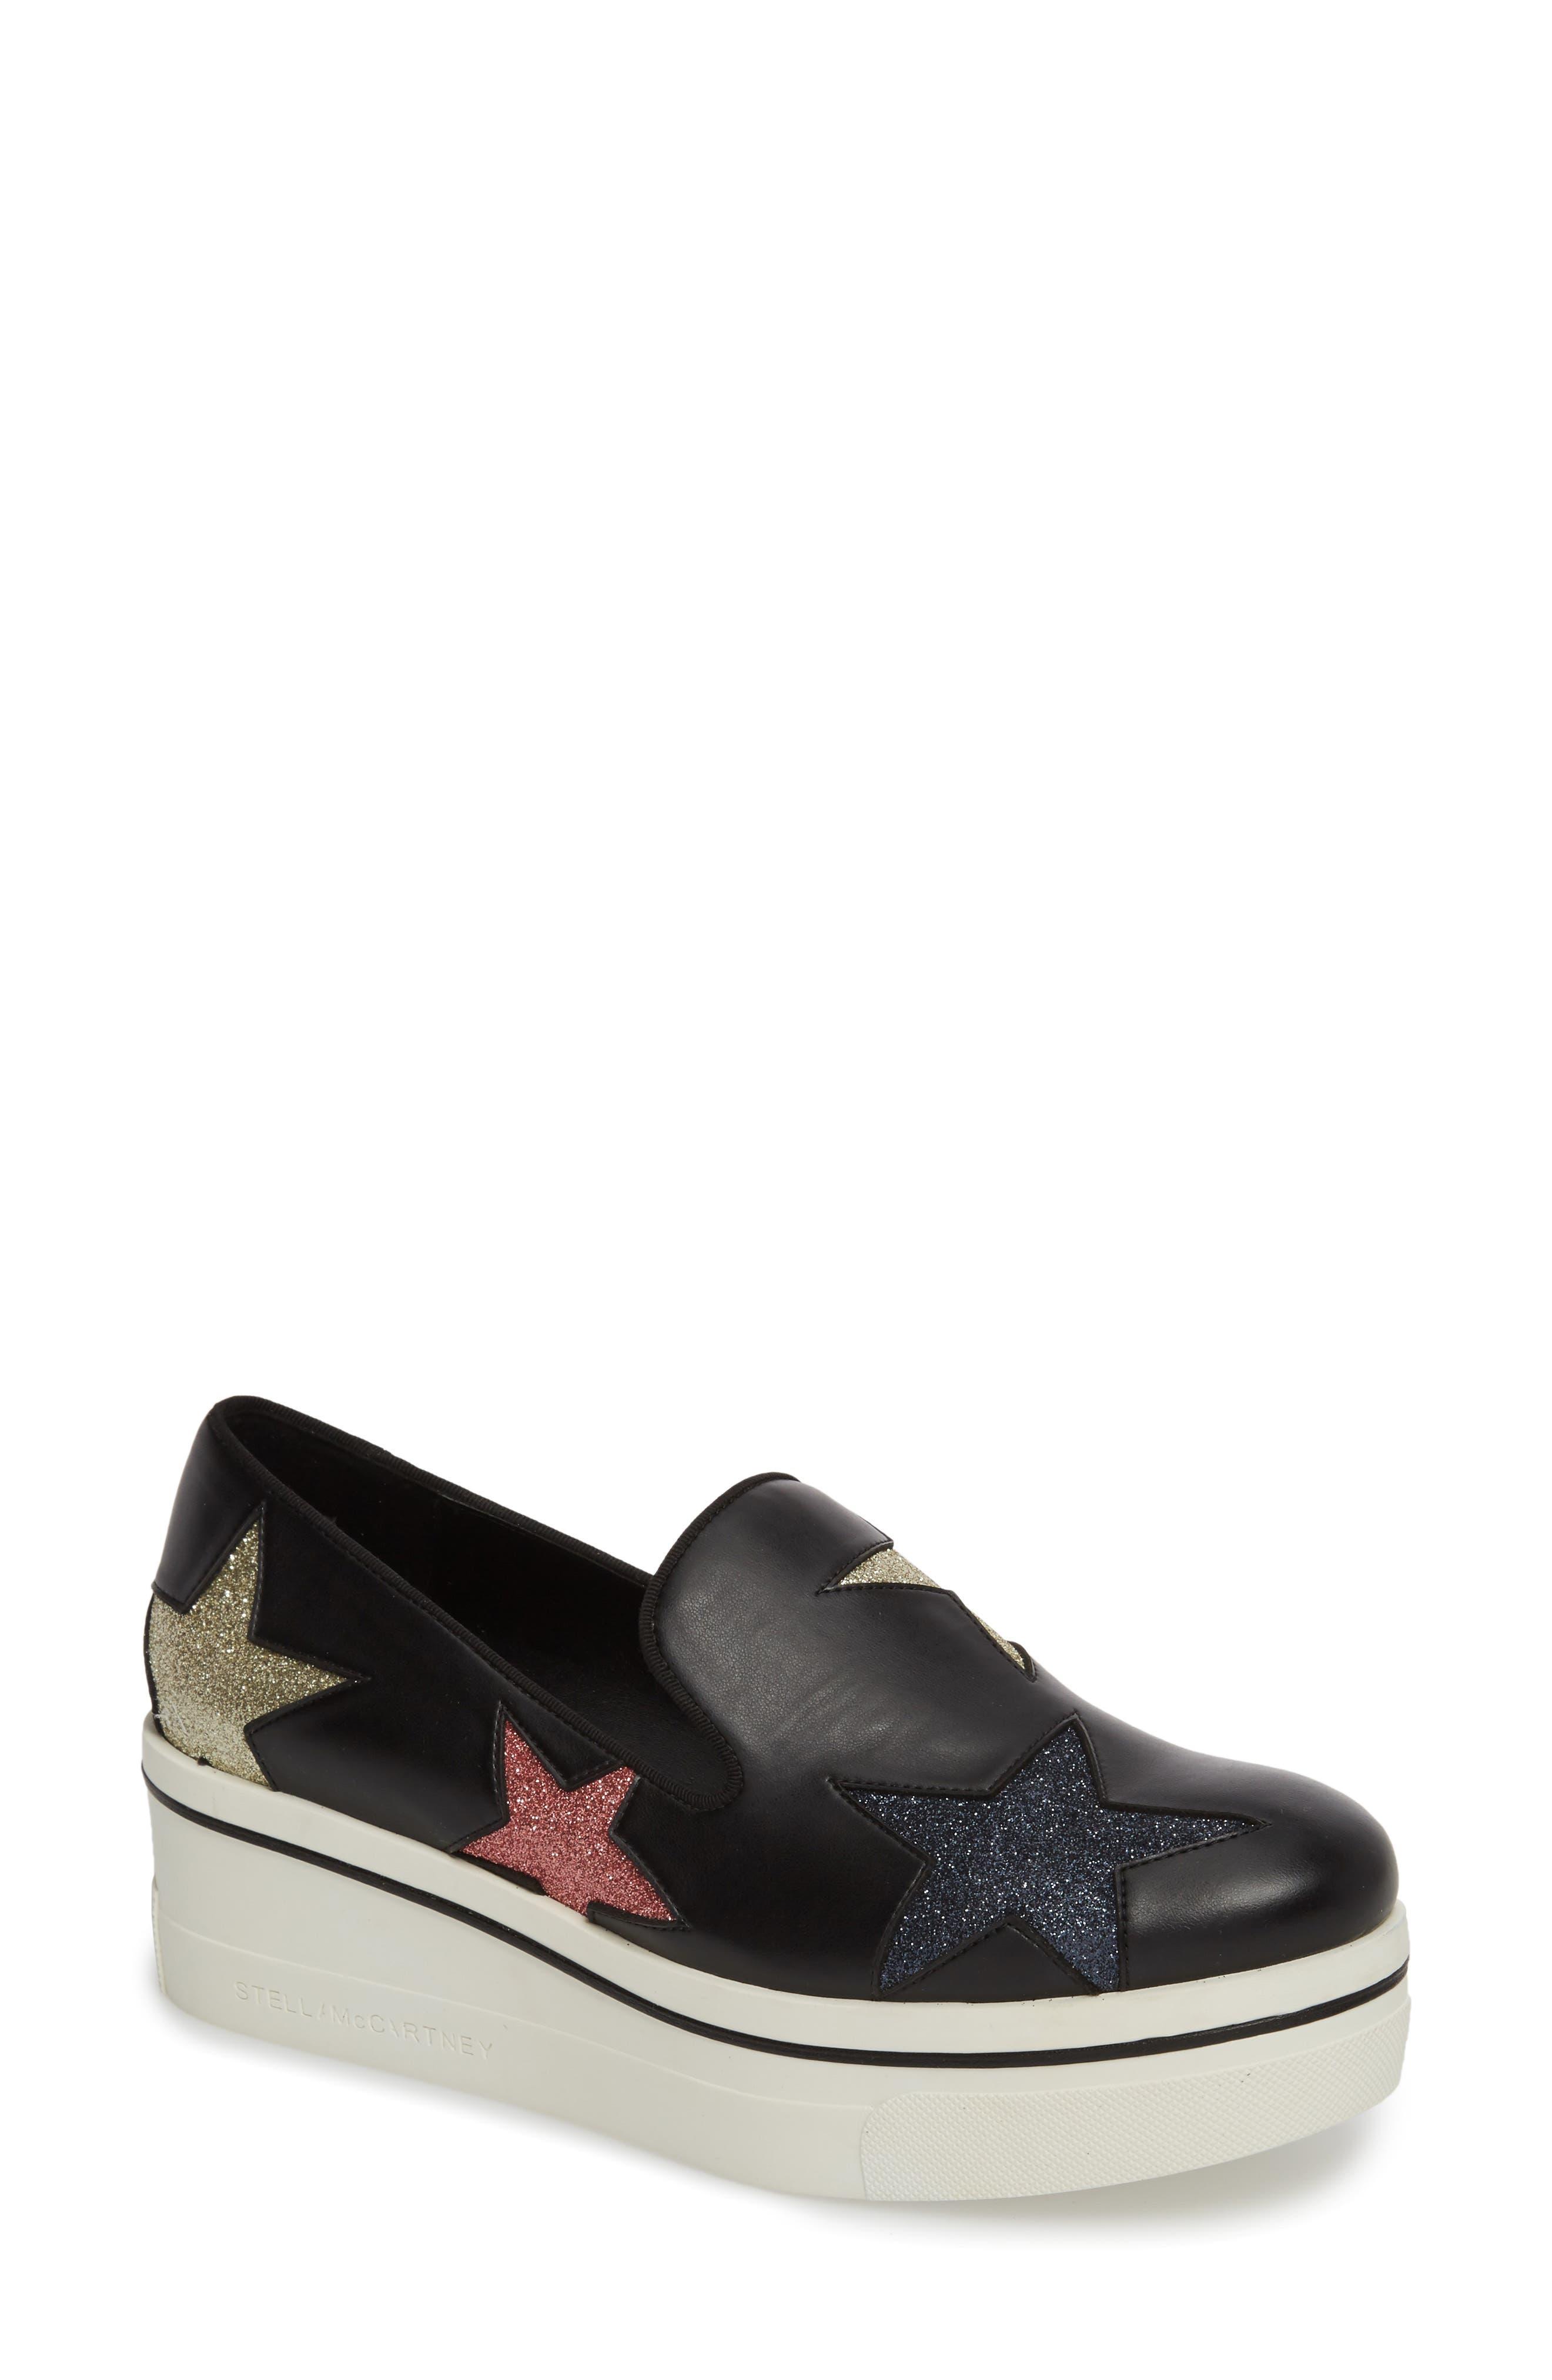 Binx Star Loafer,                         Main,                         color, Black